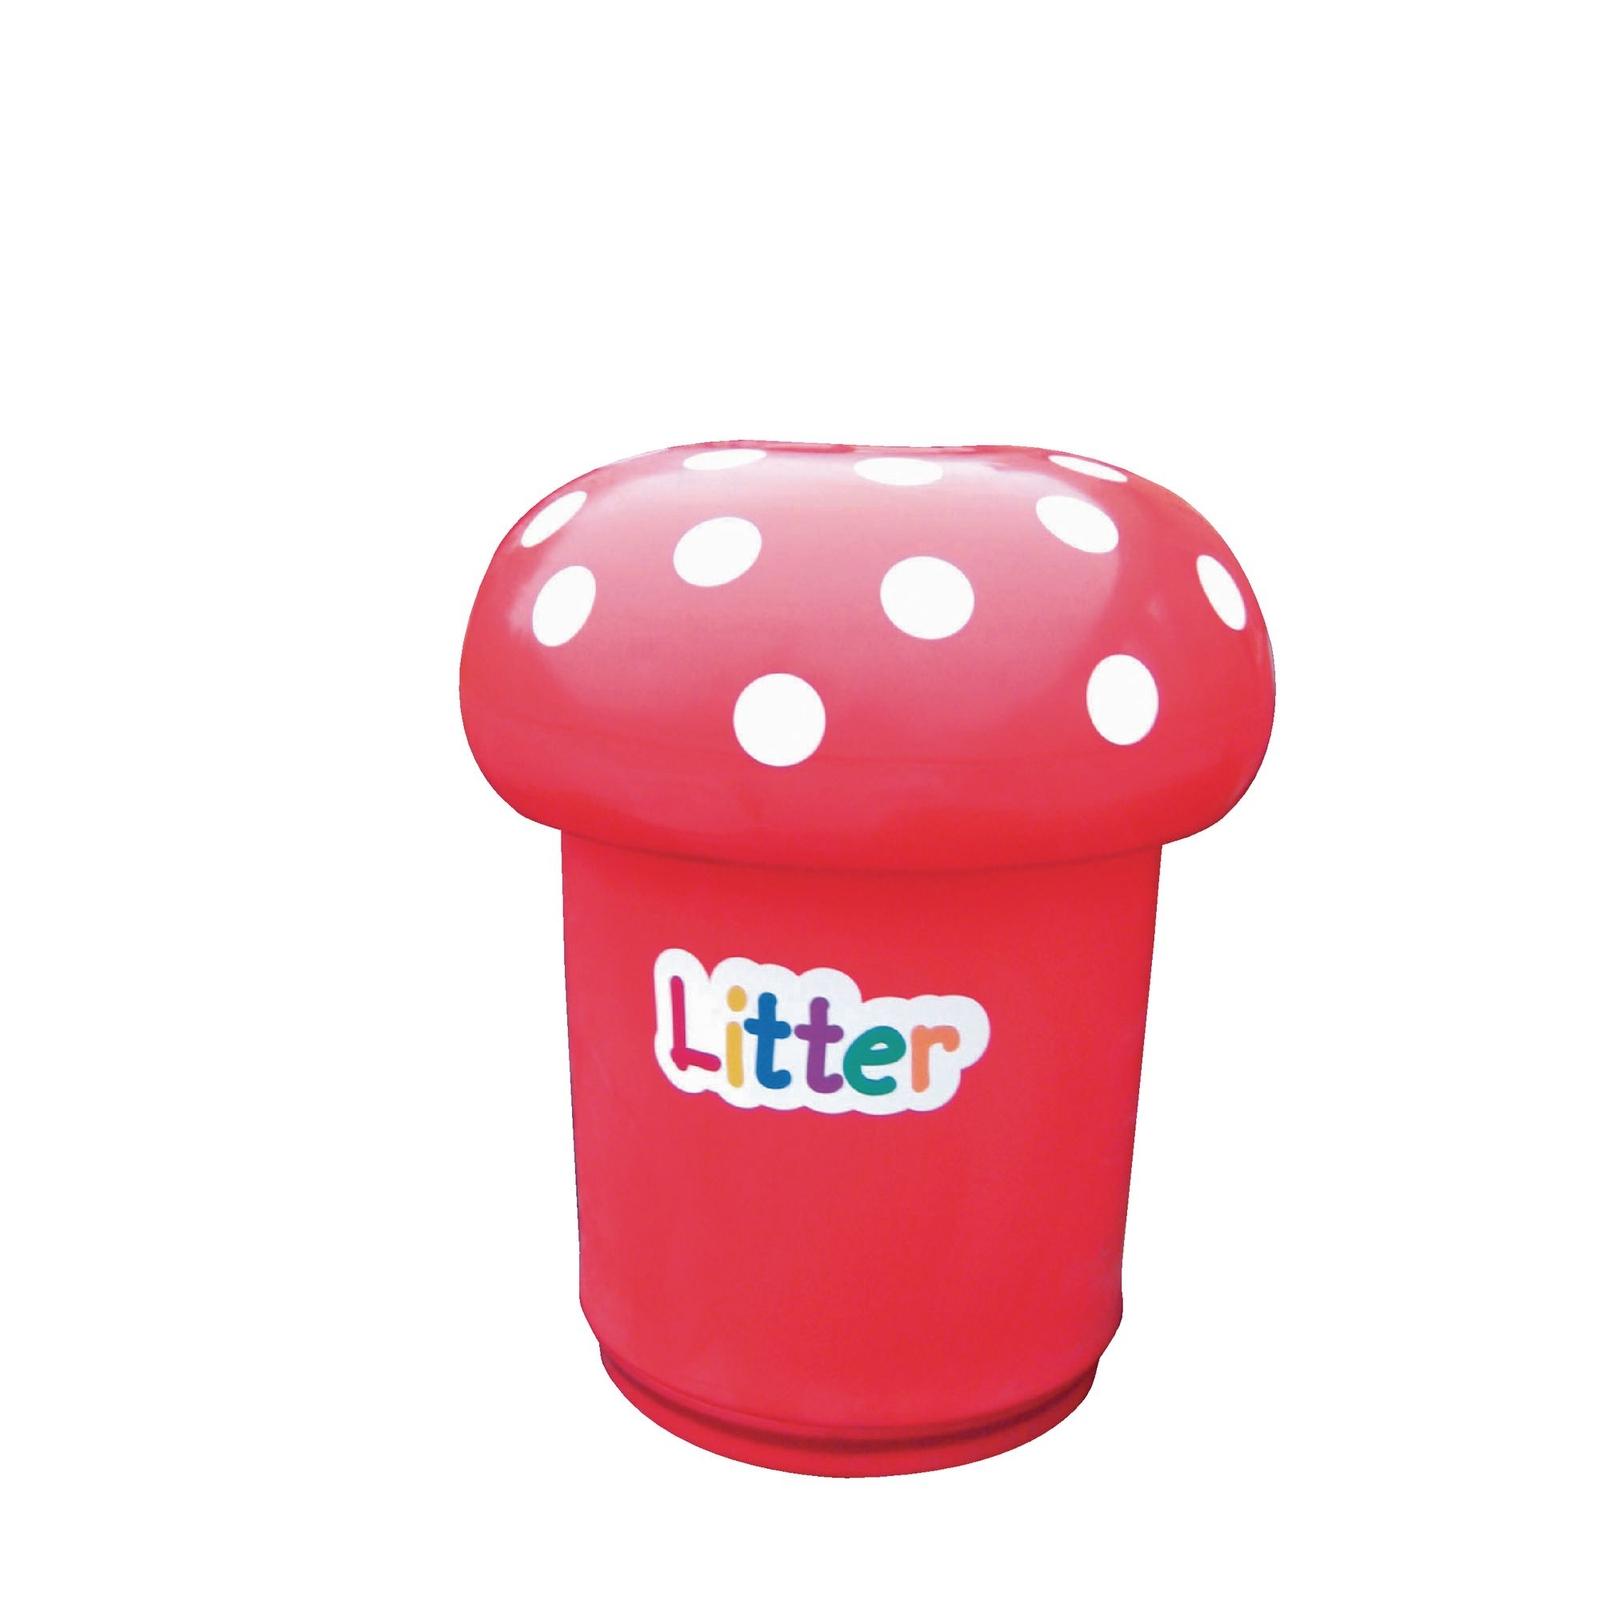 Mushroom Litter Bins - Litter label - Red